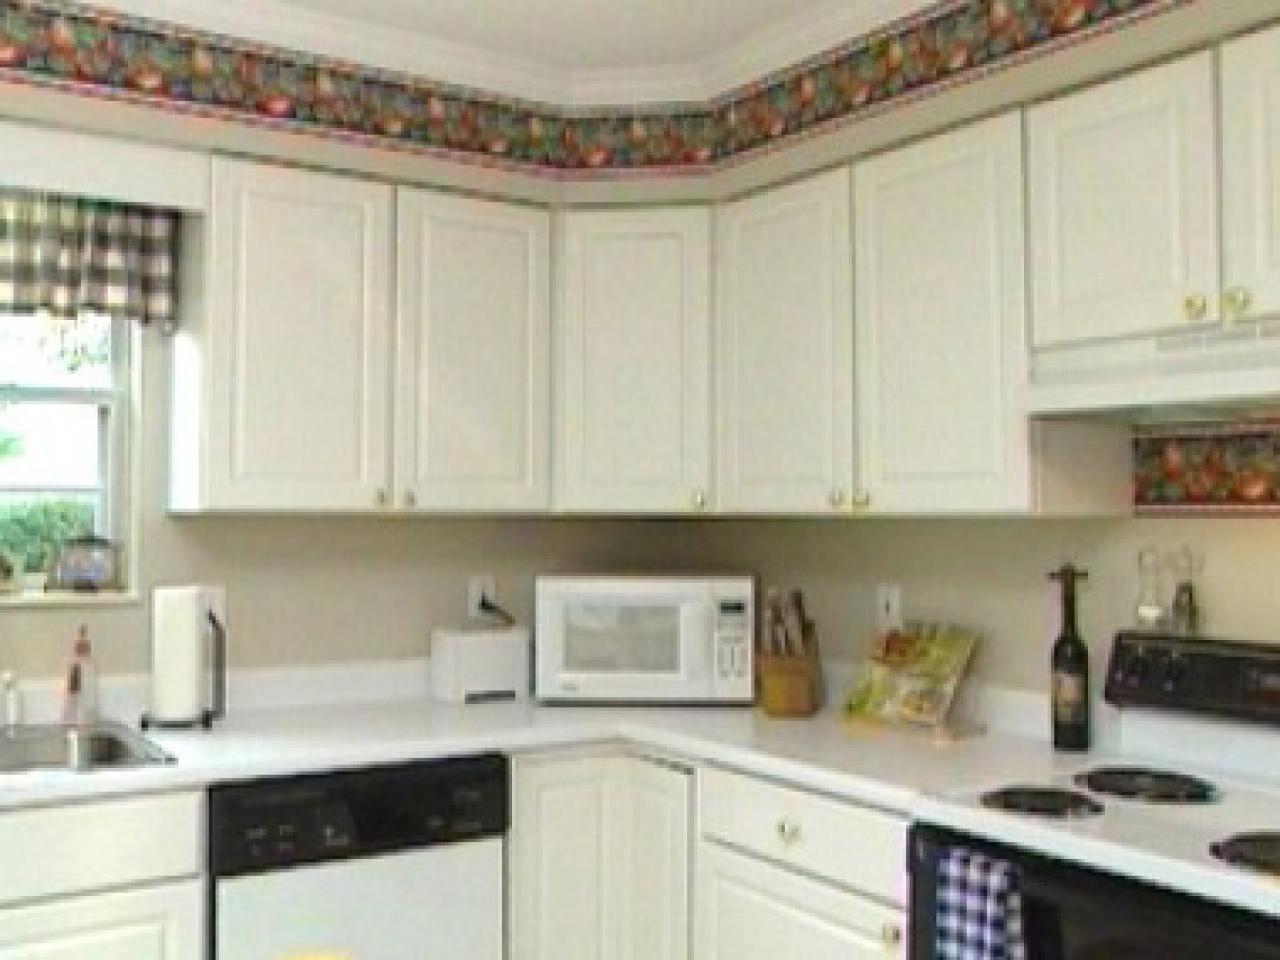 Kitchen Countertop Demolition Cost